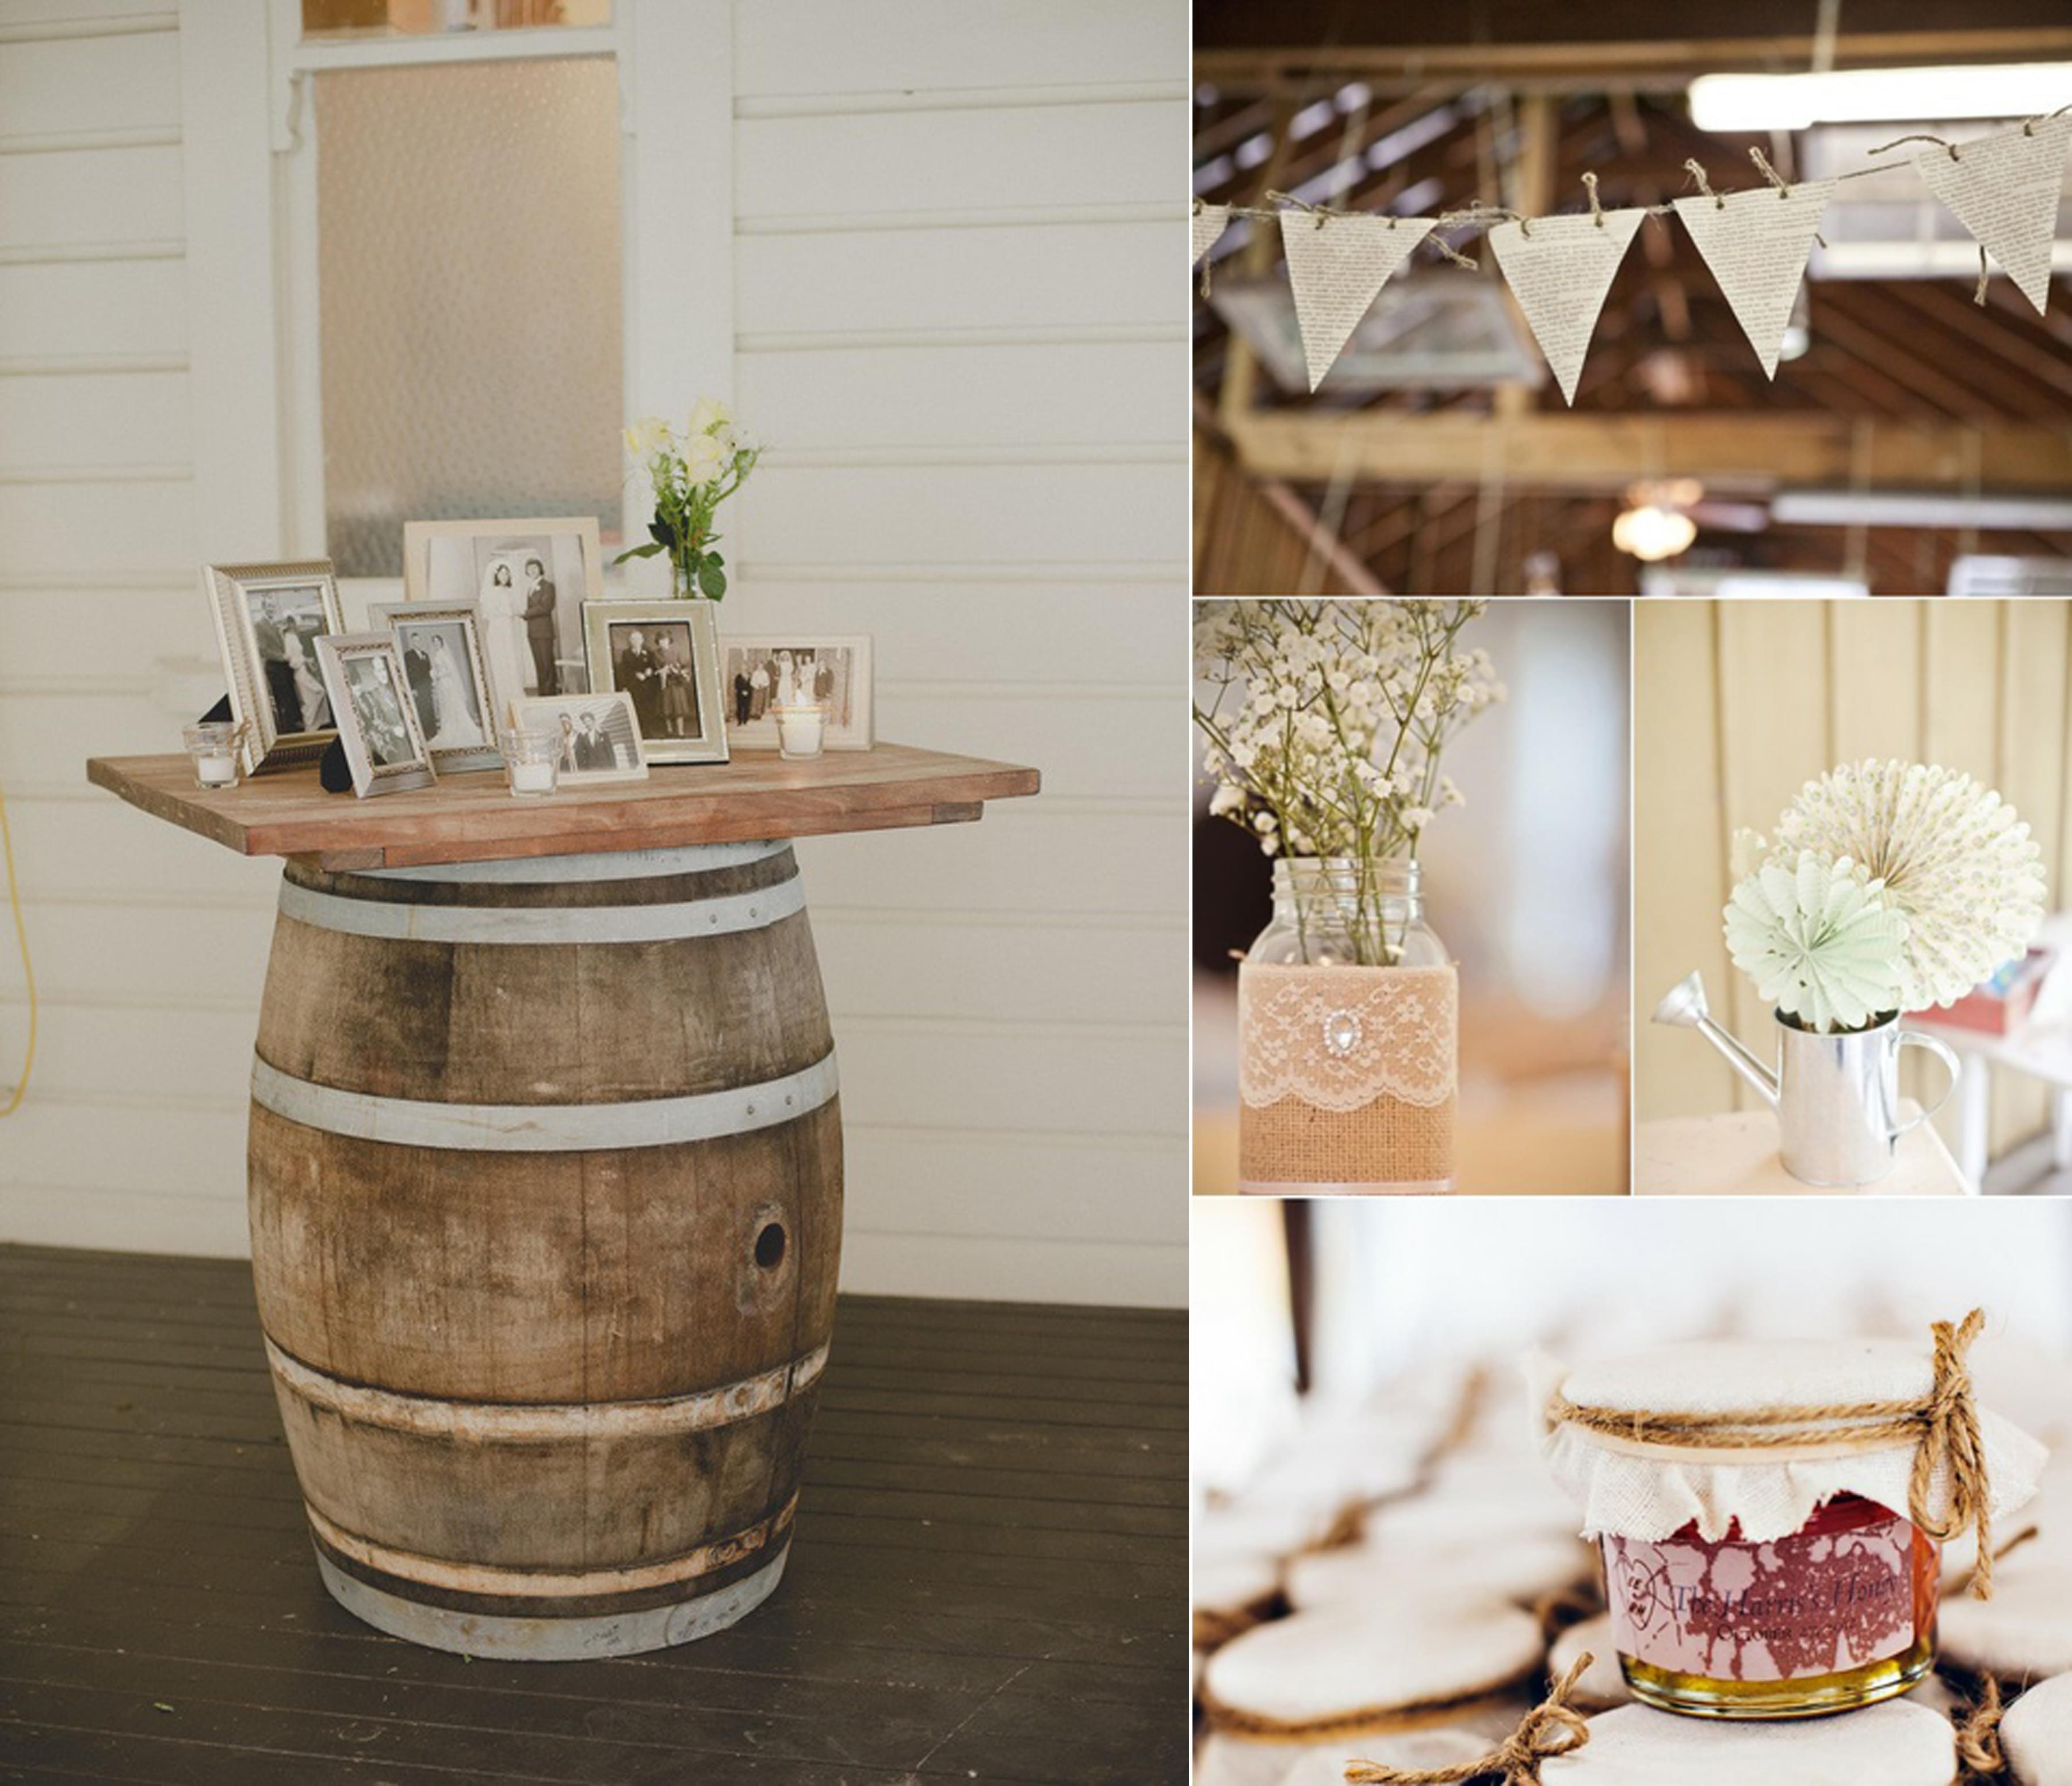 rustykalne dekoracje korek wino winiarnia slub wesele diy blog inspiracje